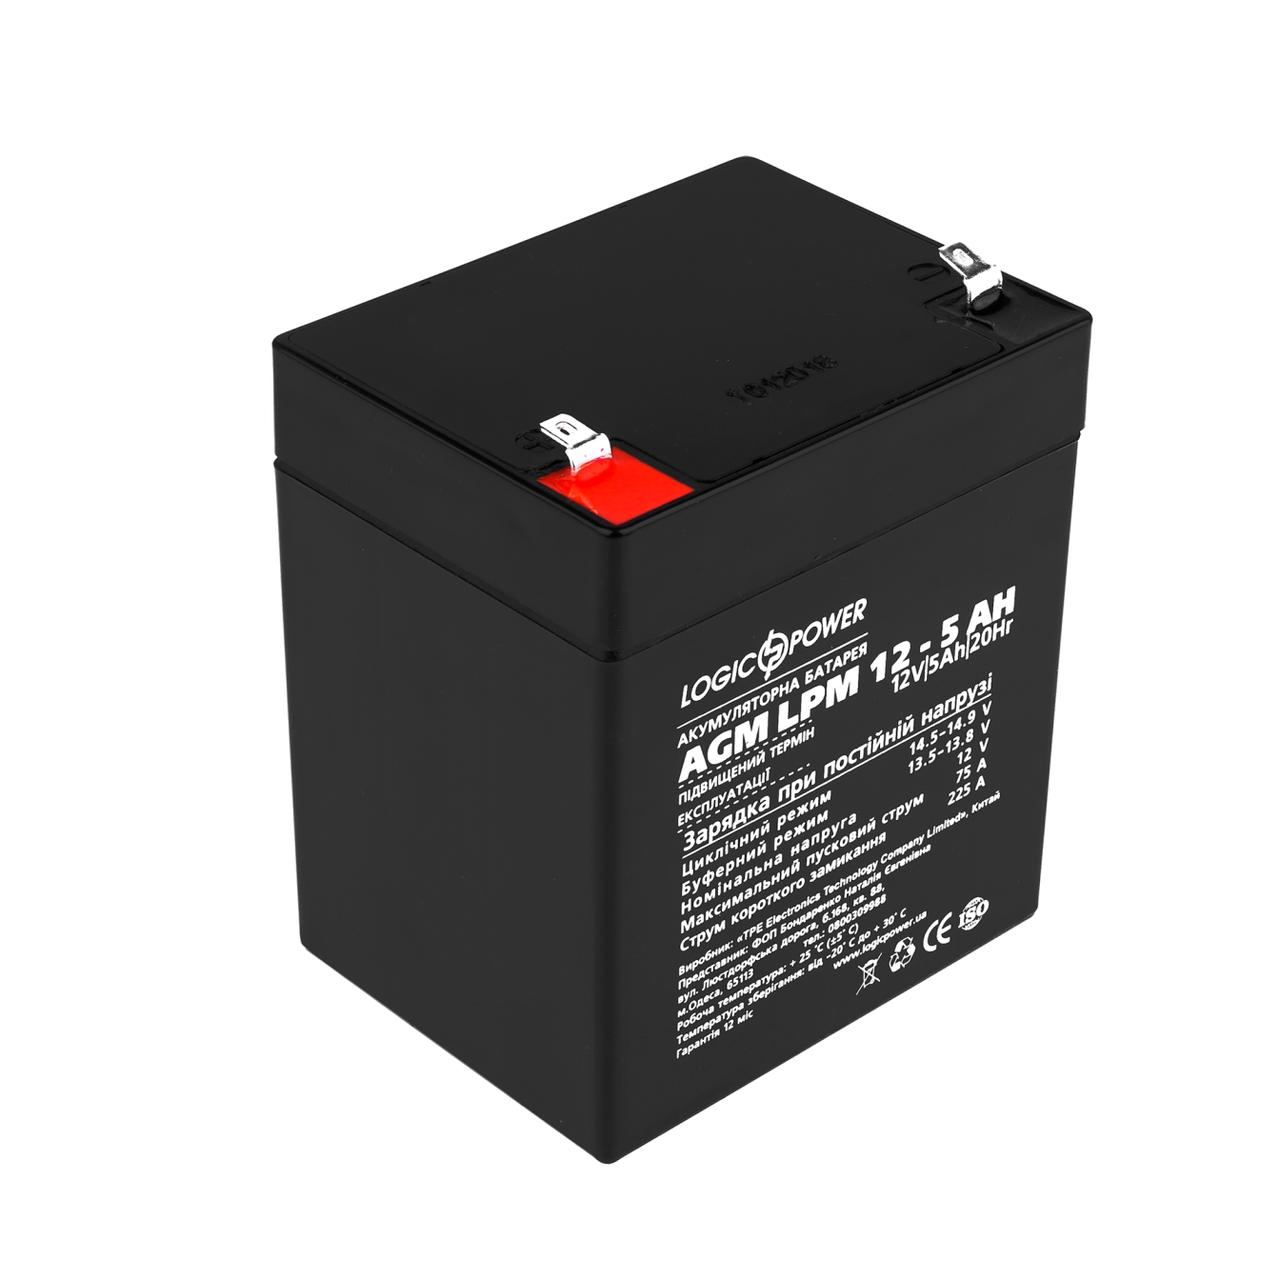 Акумулятор AGM LogicPower LPM 12 - 5,0 AH